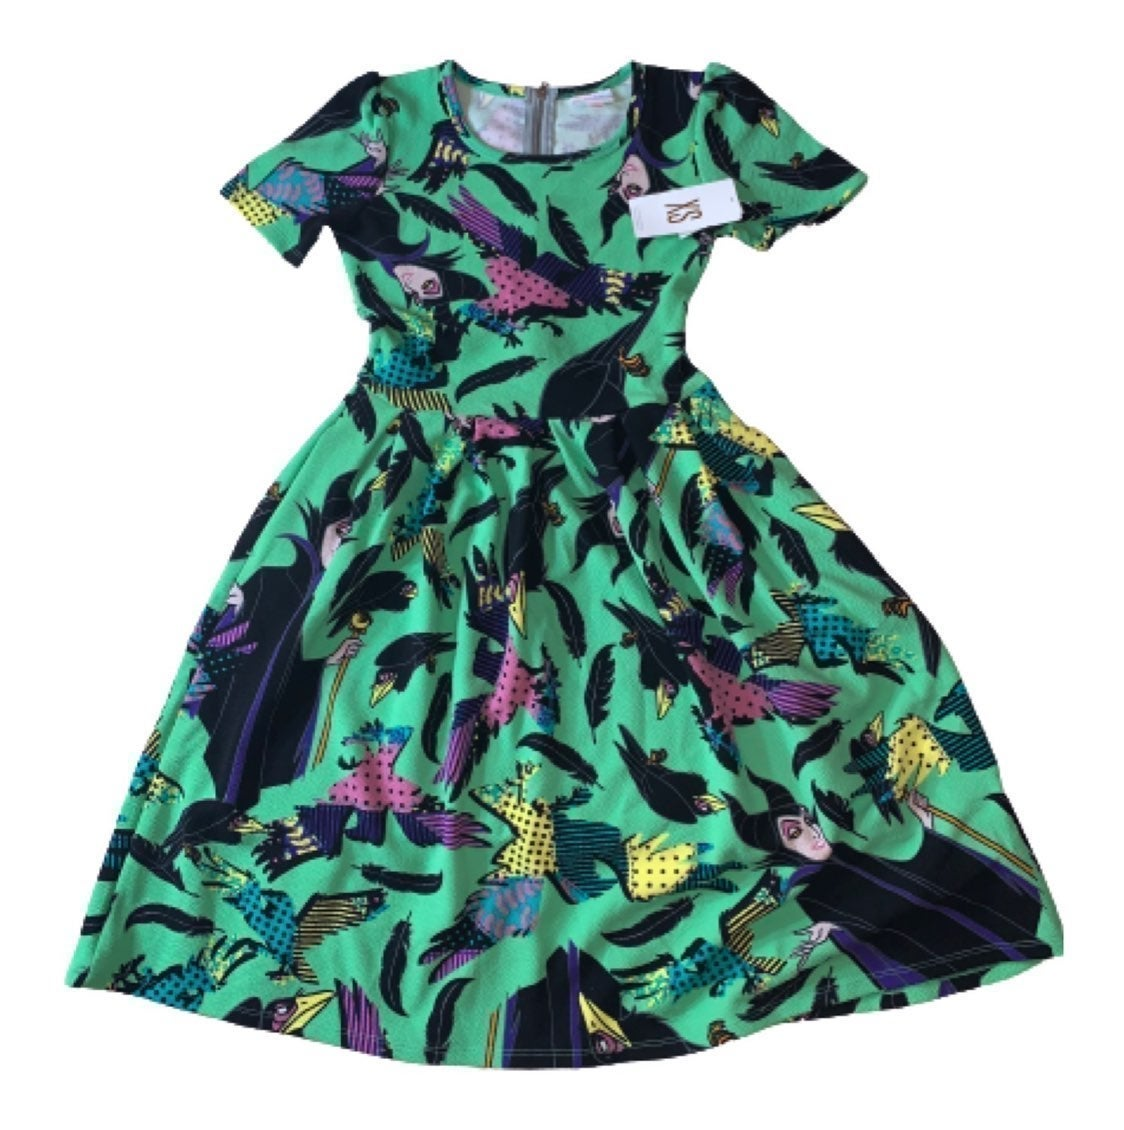 Lularoe Size XS Disney Maleficent Dress